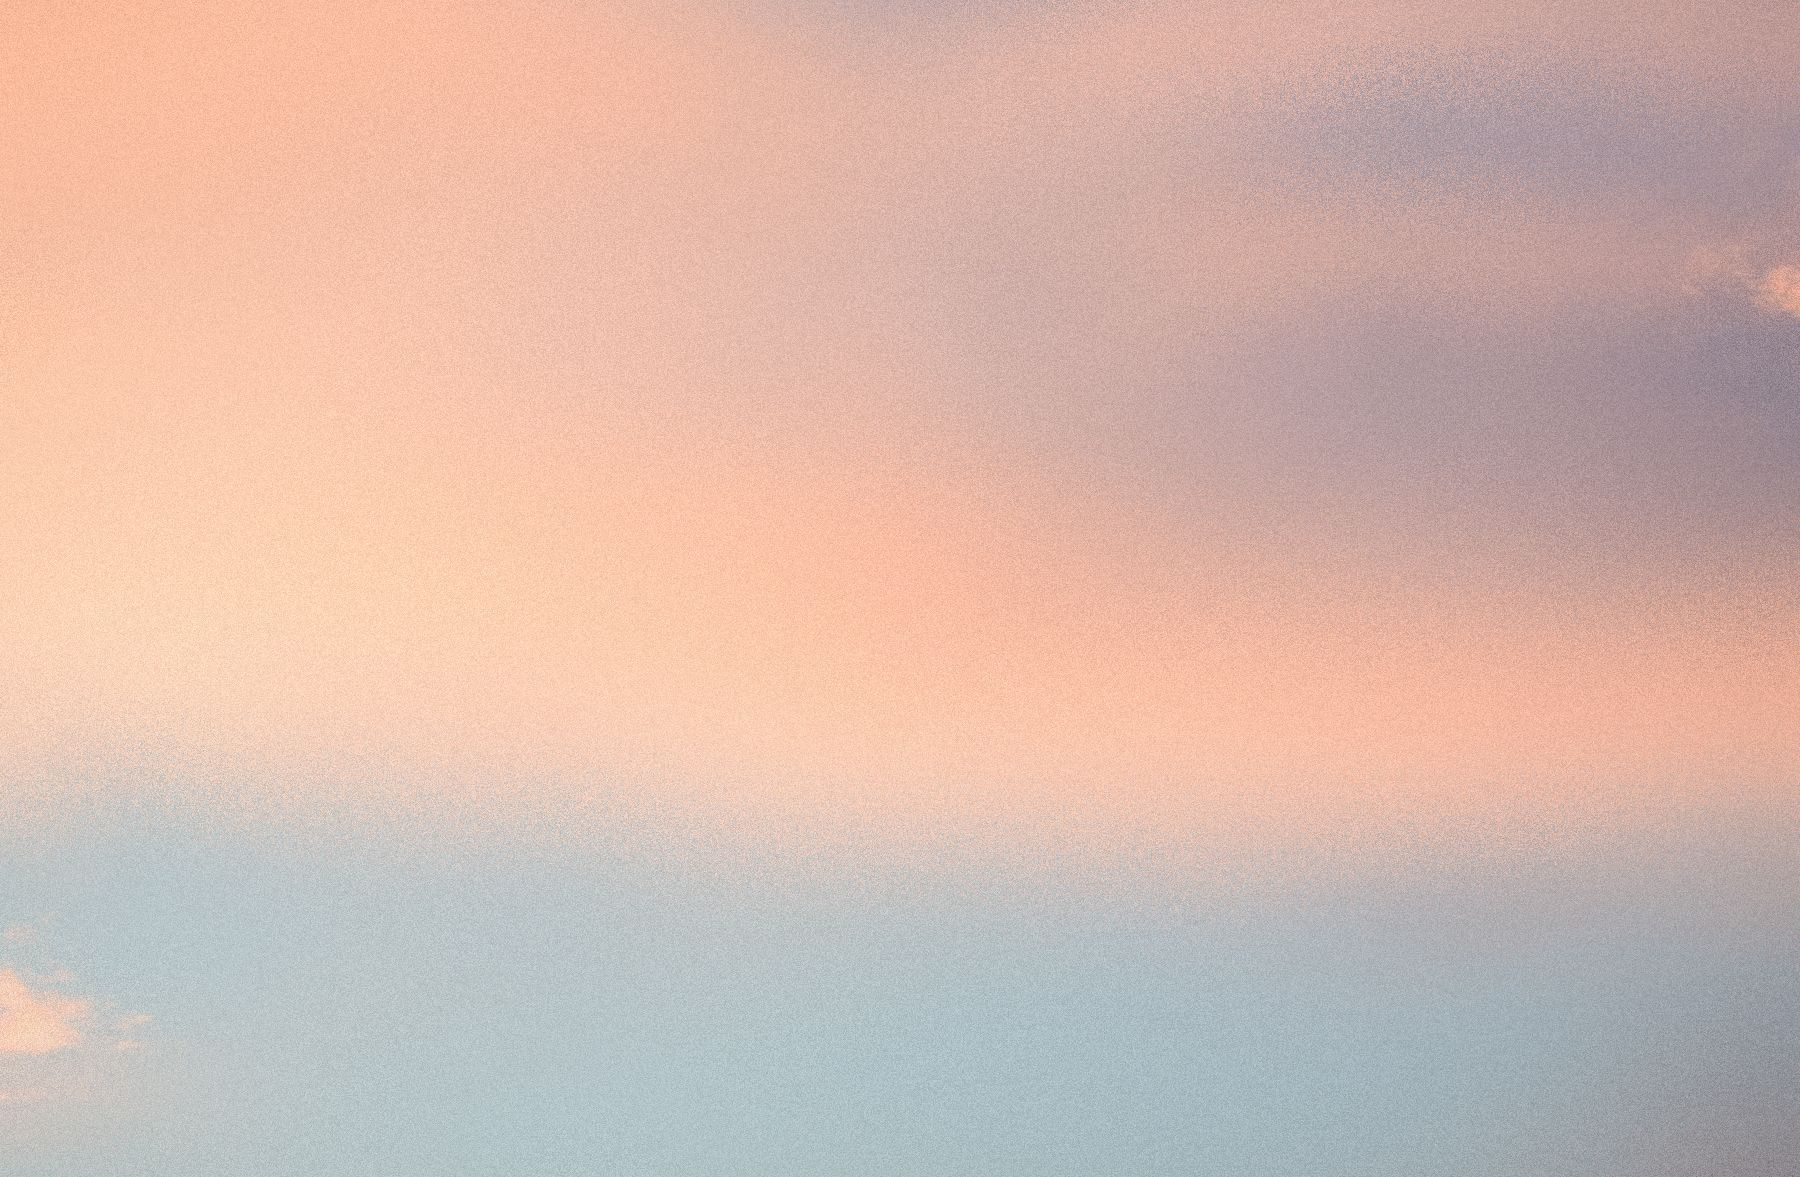 color-of-air__v01.jpg